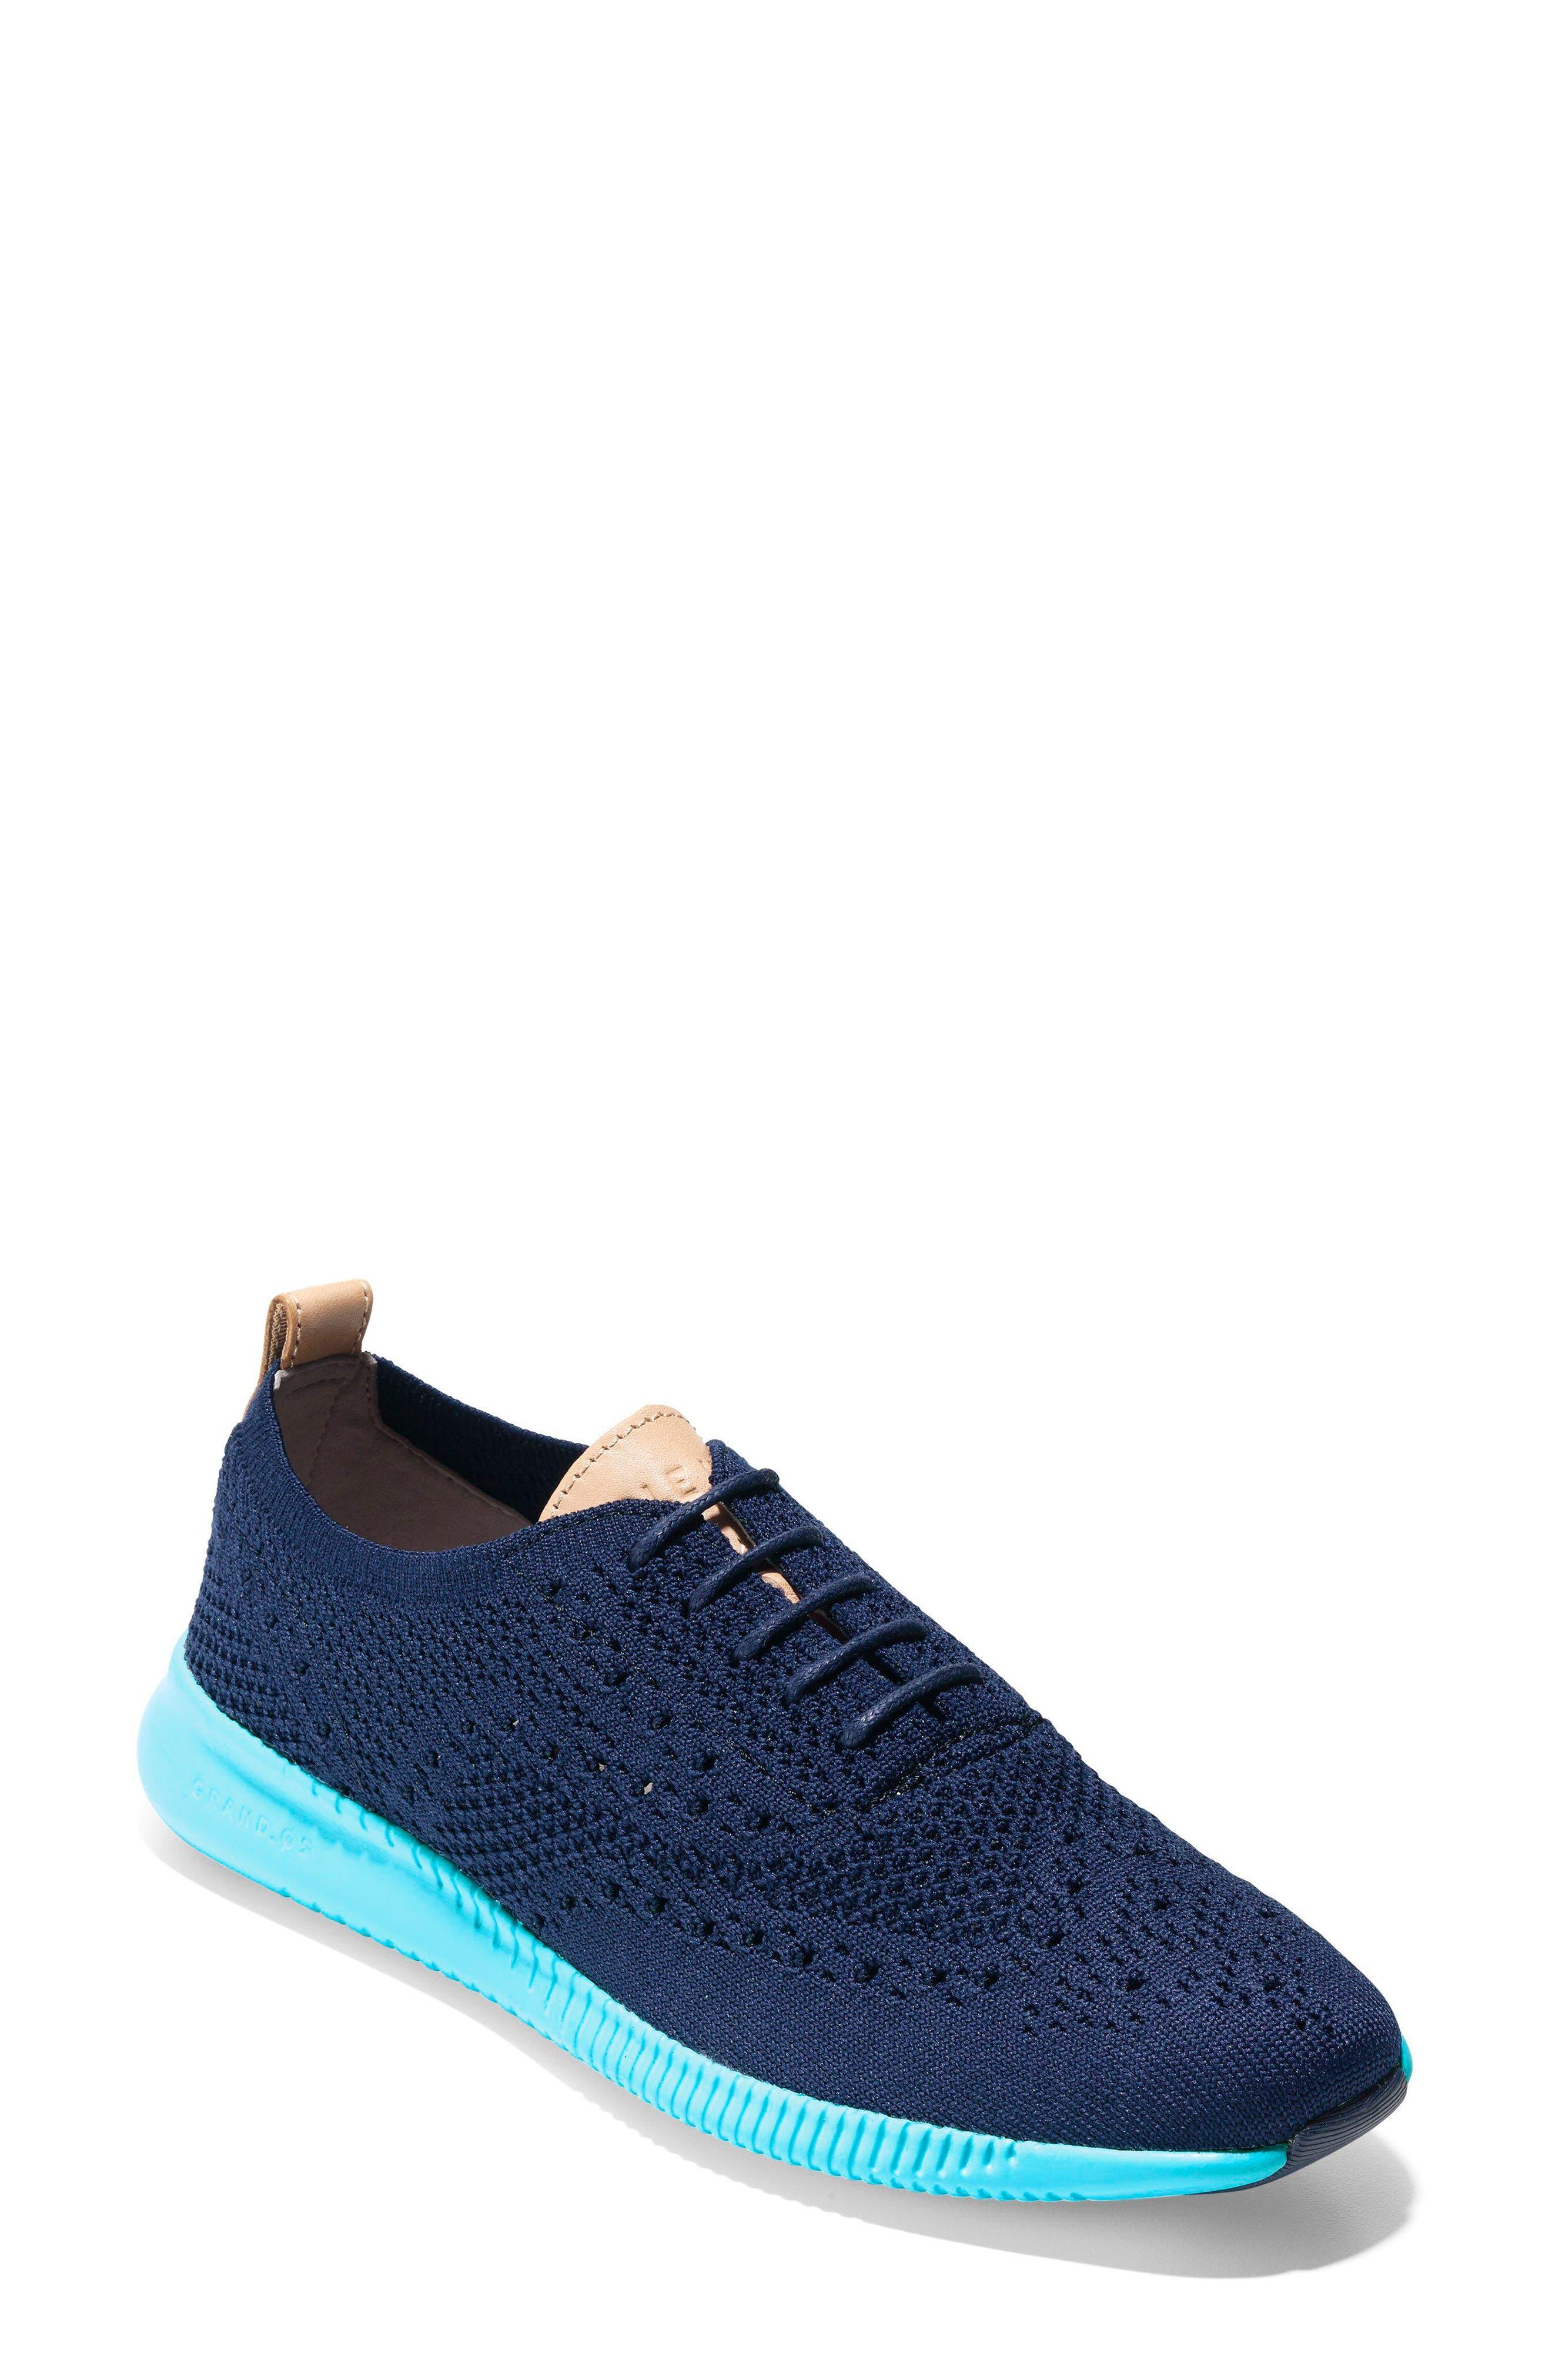 2.ZERØGRAND Stitchlite Wingtip Sneaker,                             Main thumbnail 1, color,                             MARINE BLUE/ BLUEFISH FABRIC